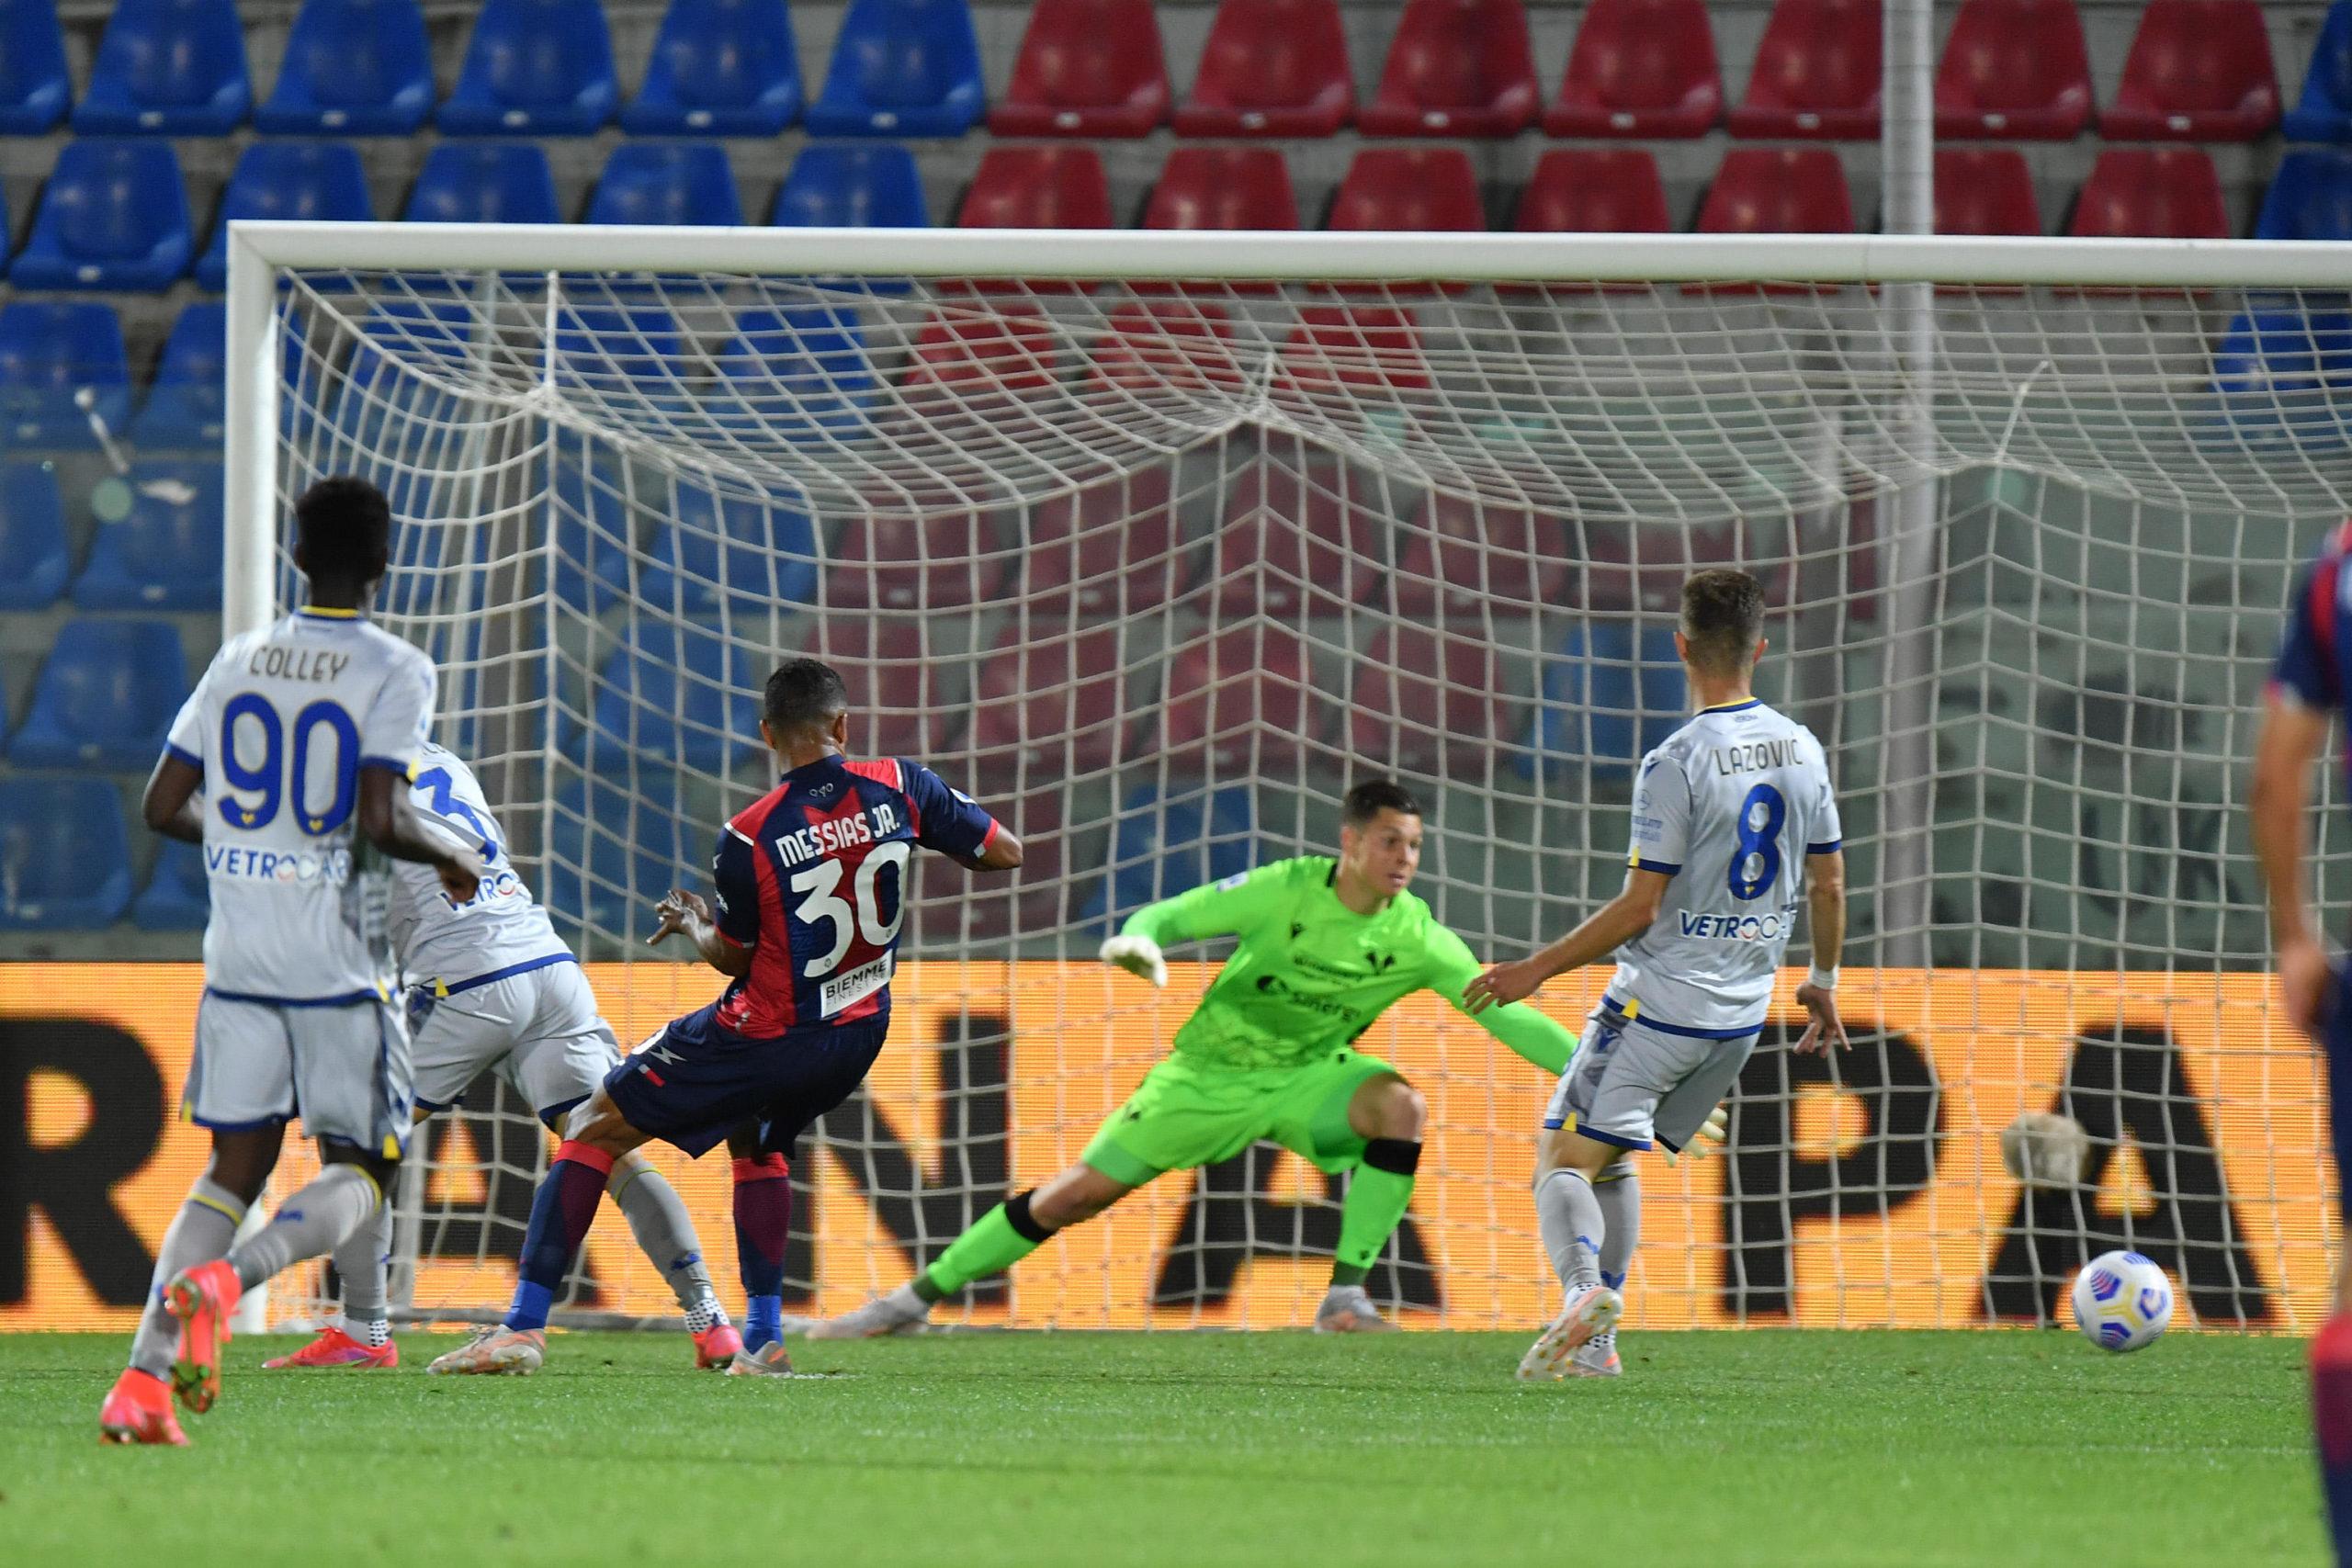 Junior Mesias scores for Crotone against Verona